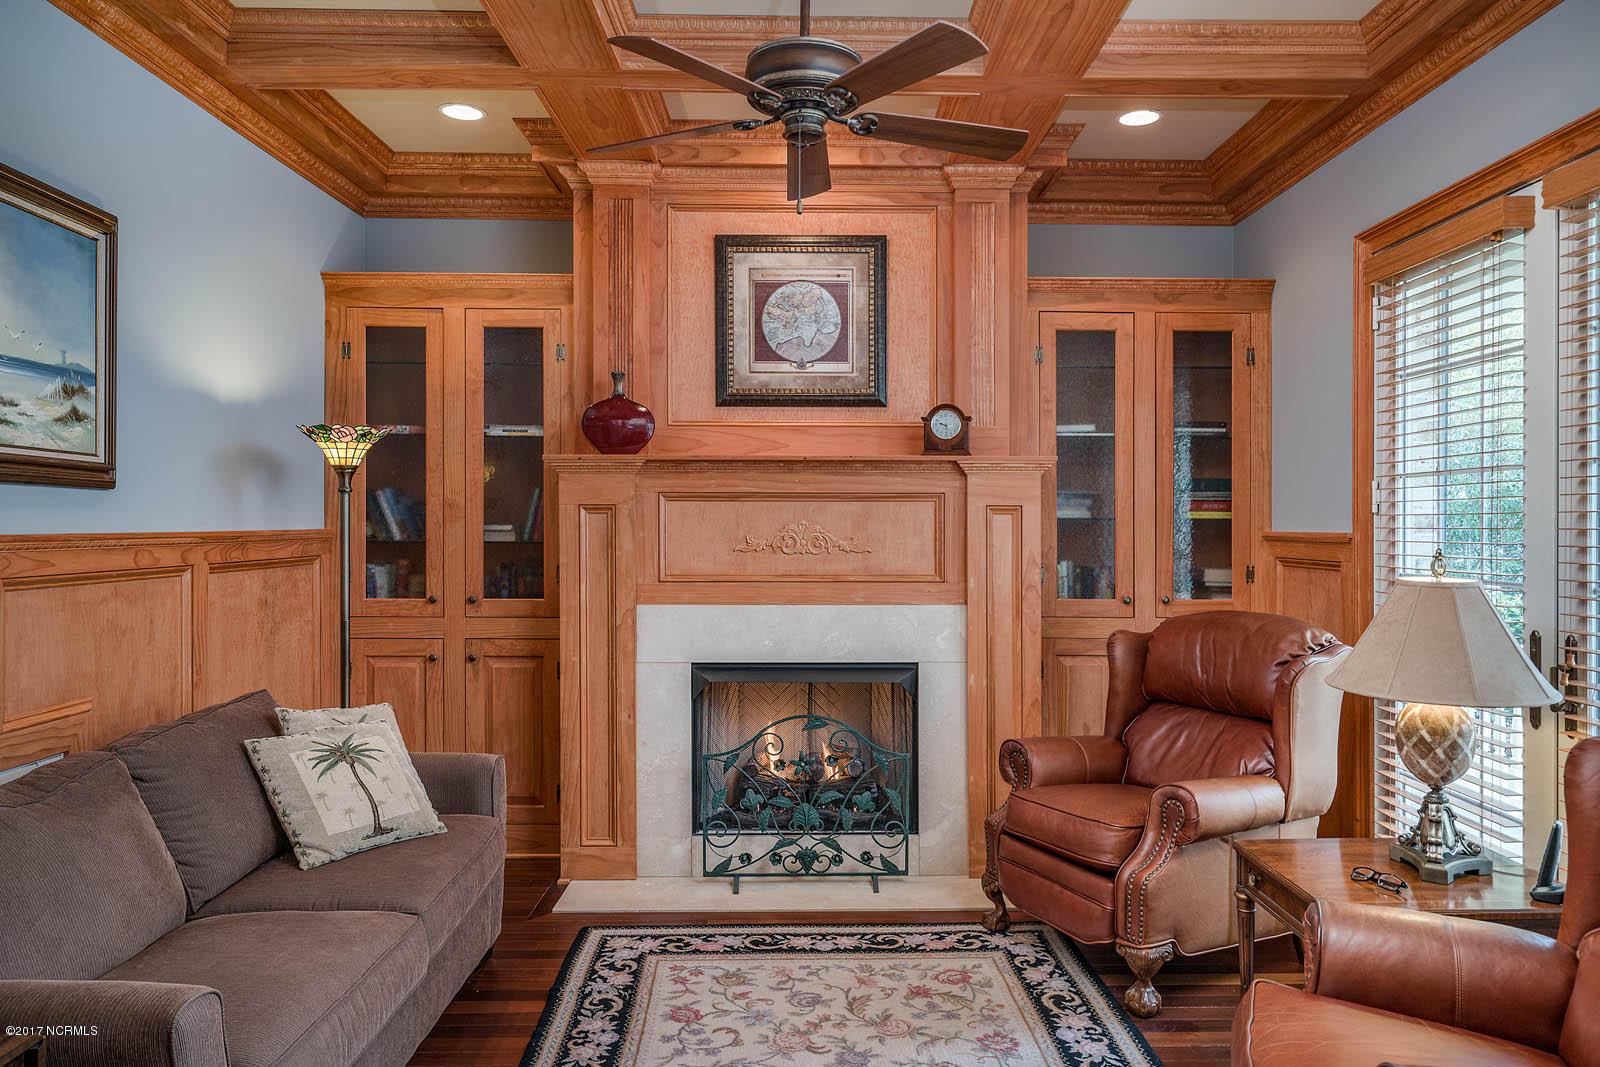 Bolivia Real Estate For Sale - MLS 100056340